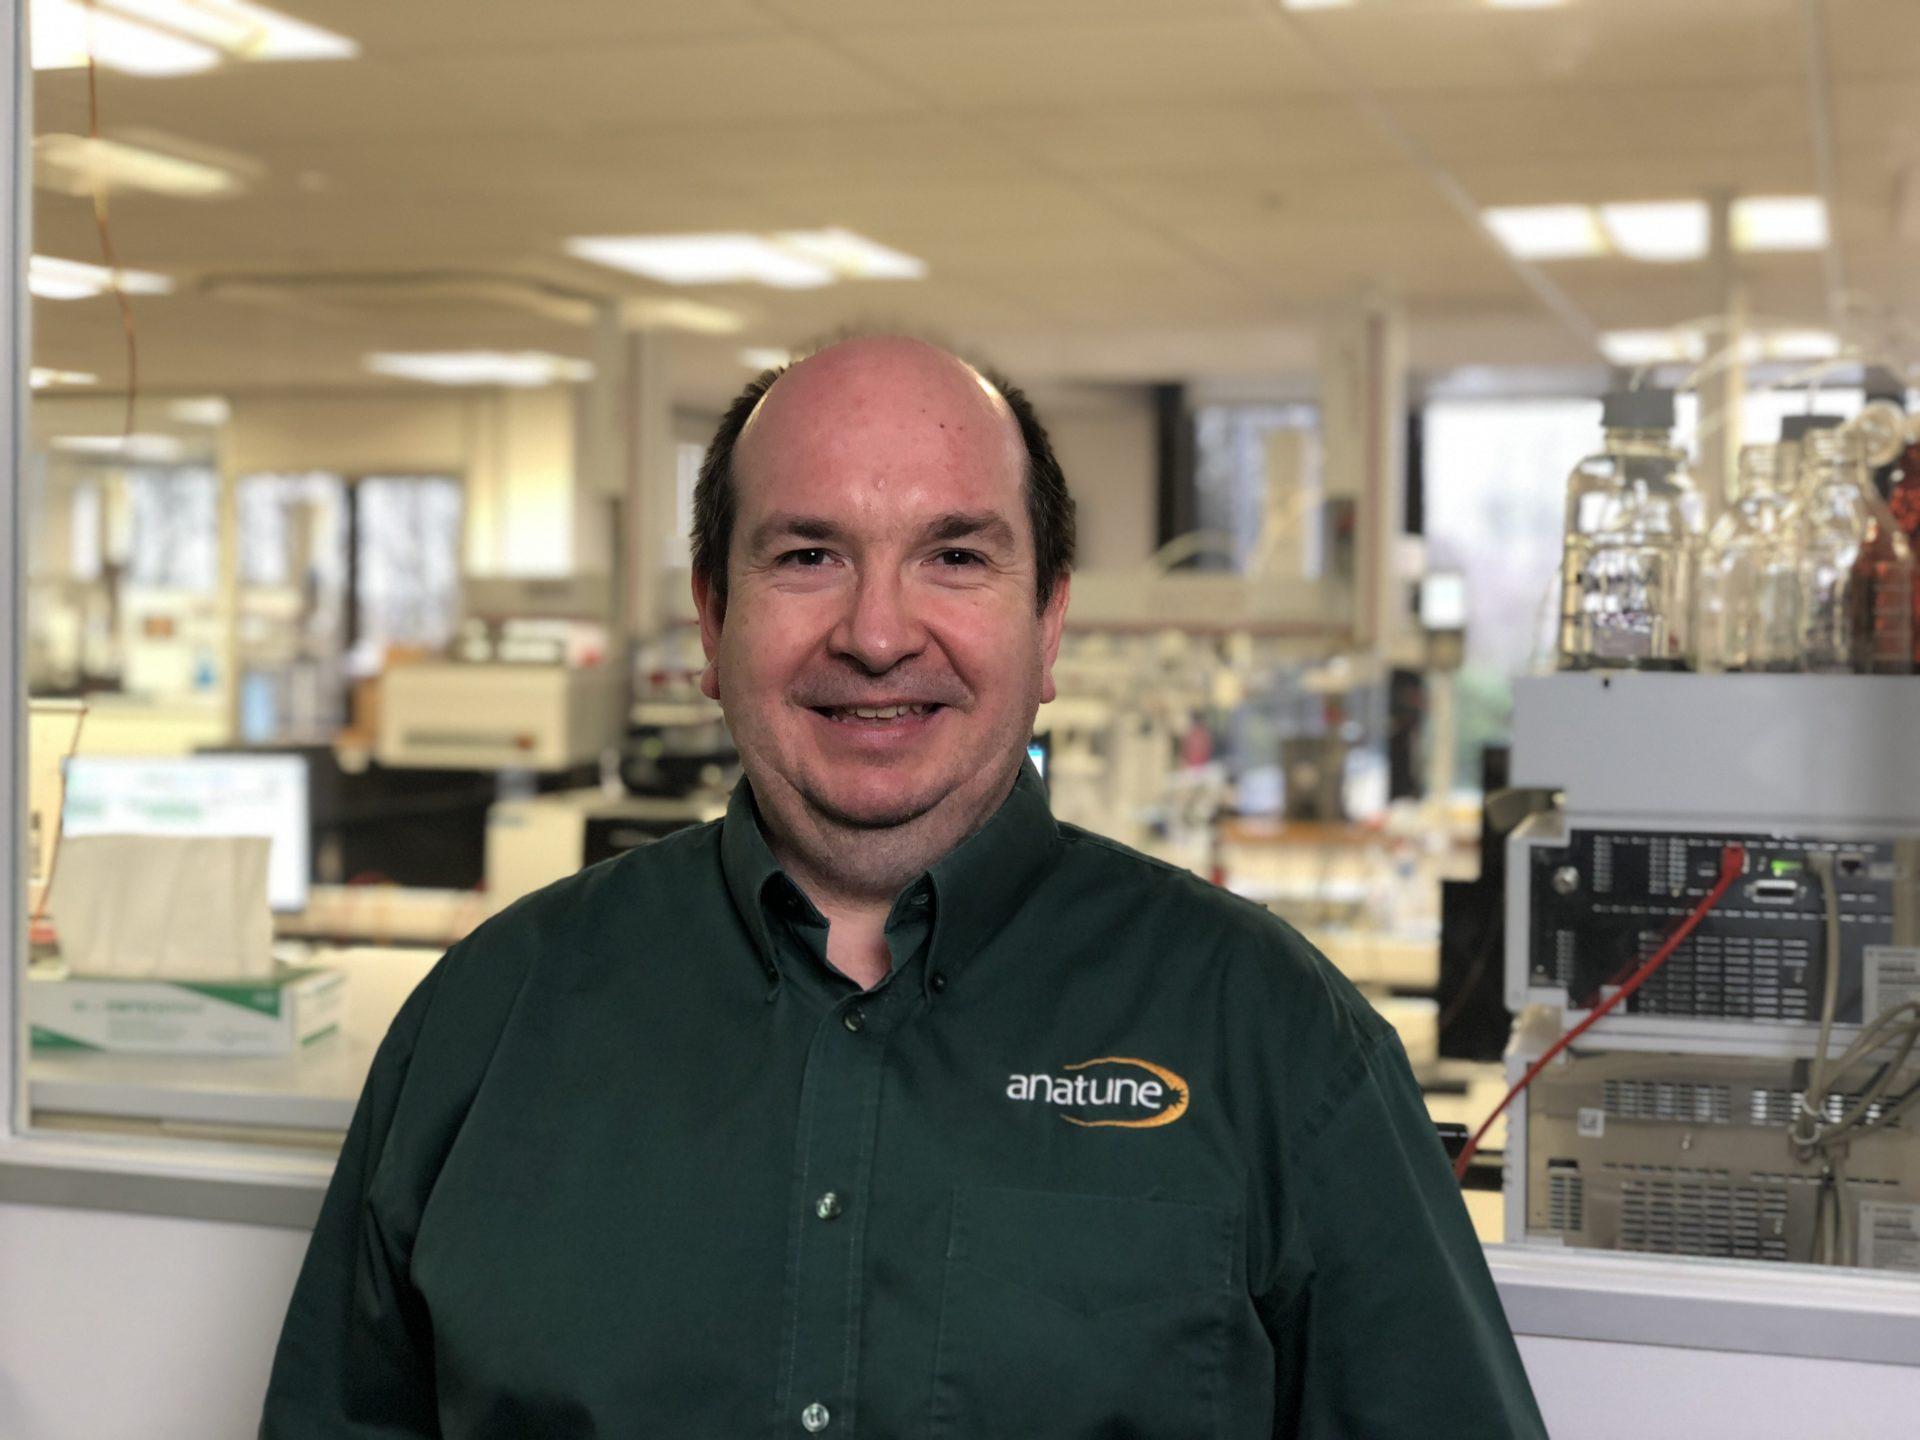 Simon McInulty, Senior Support Engineer